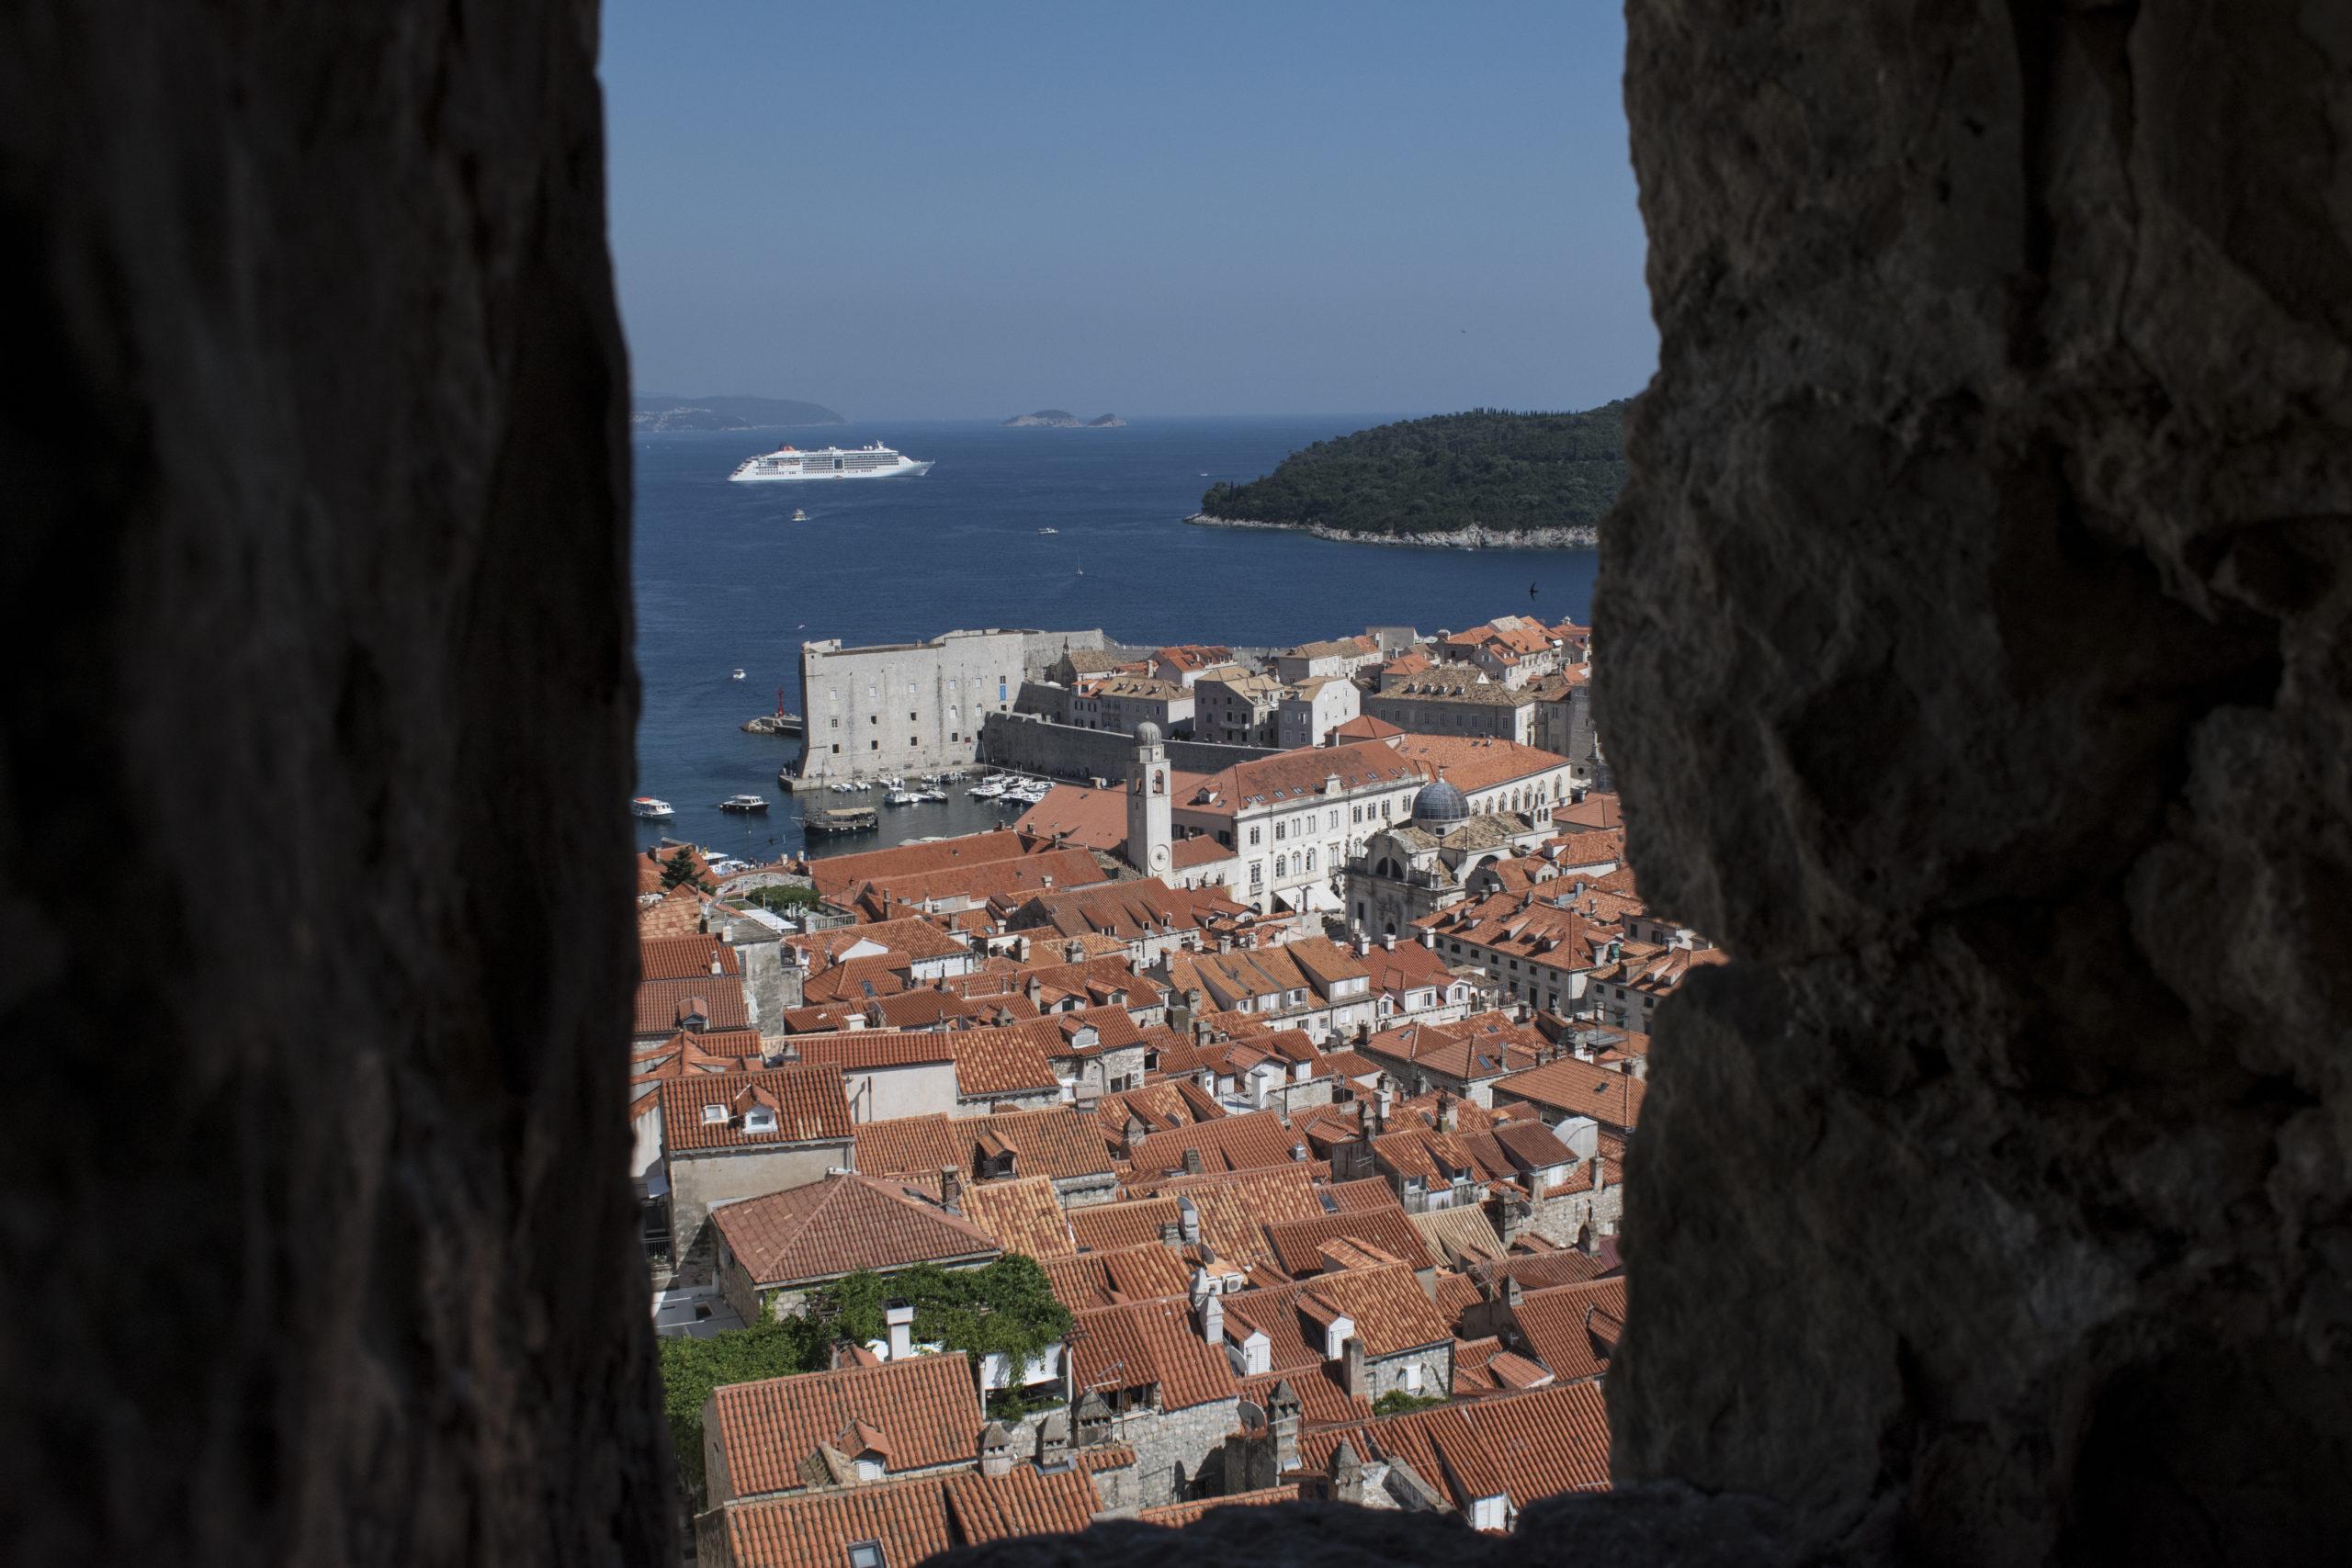 Croatie, voyages, ville, côte croate